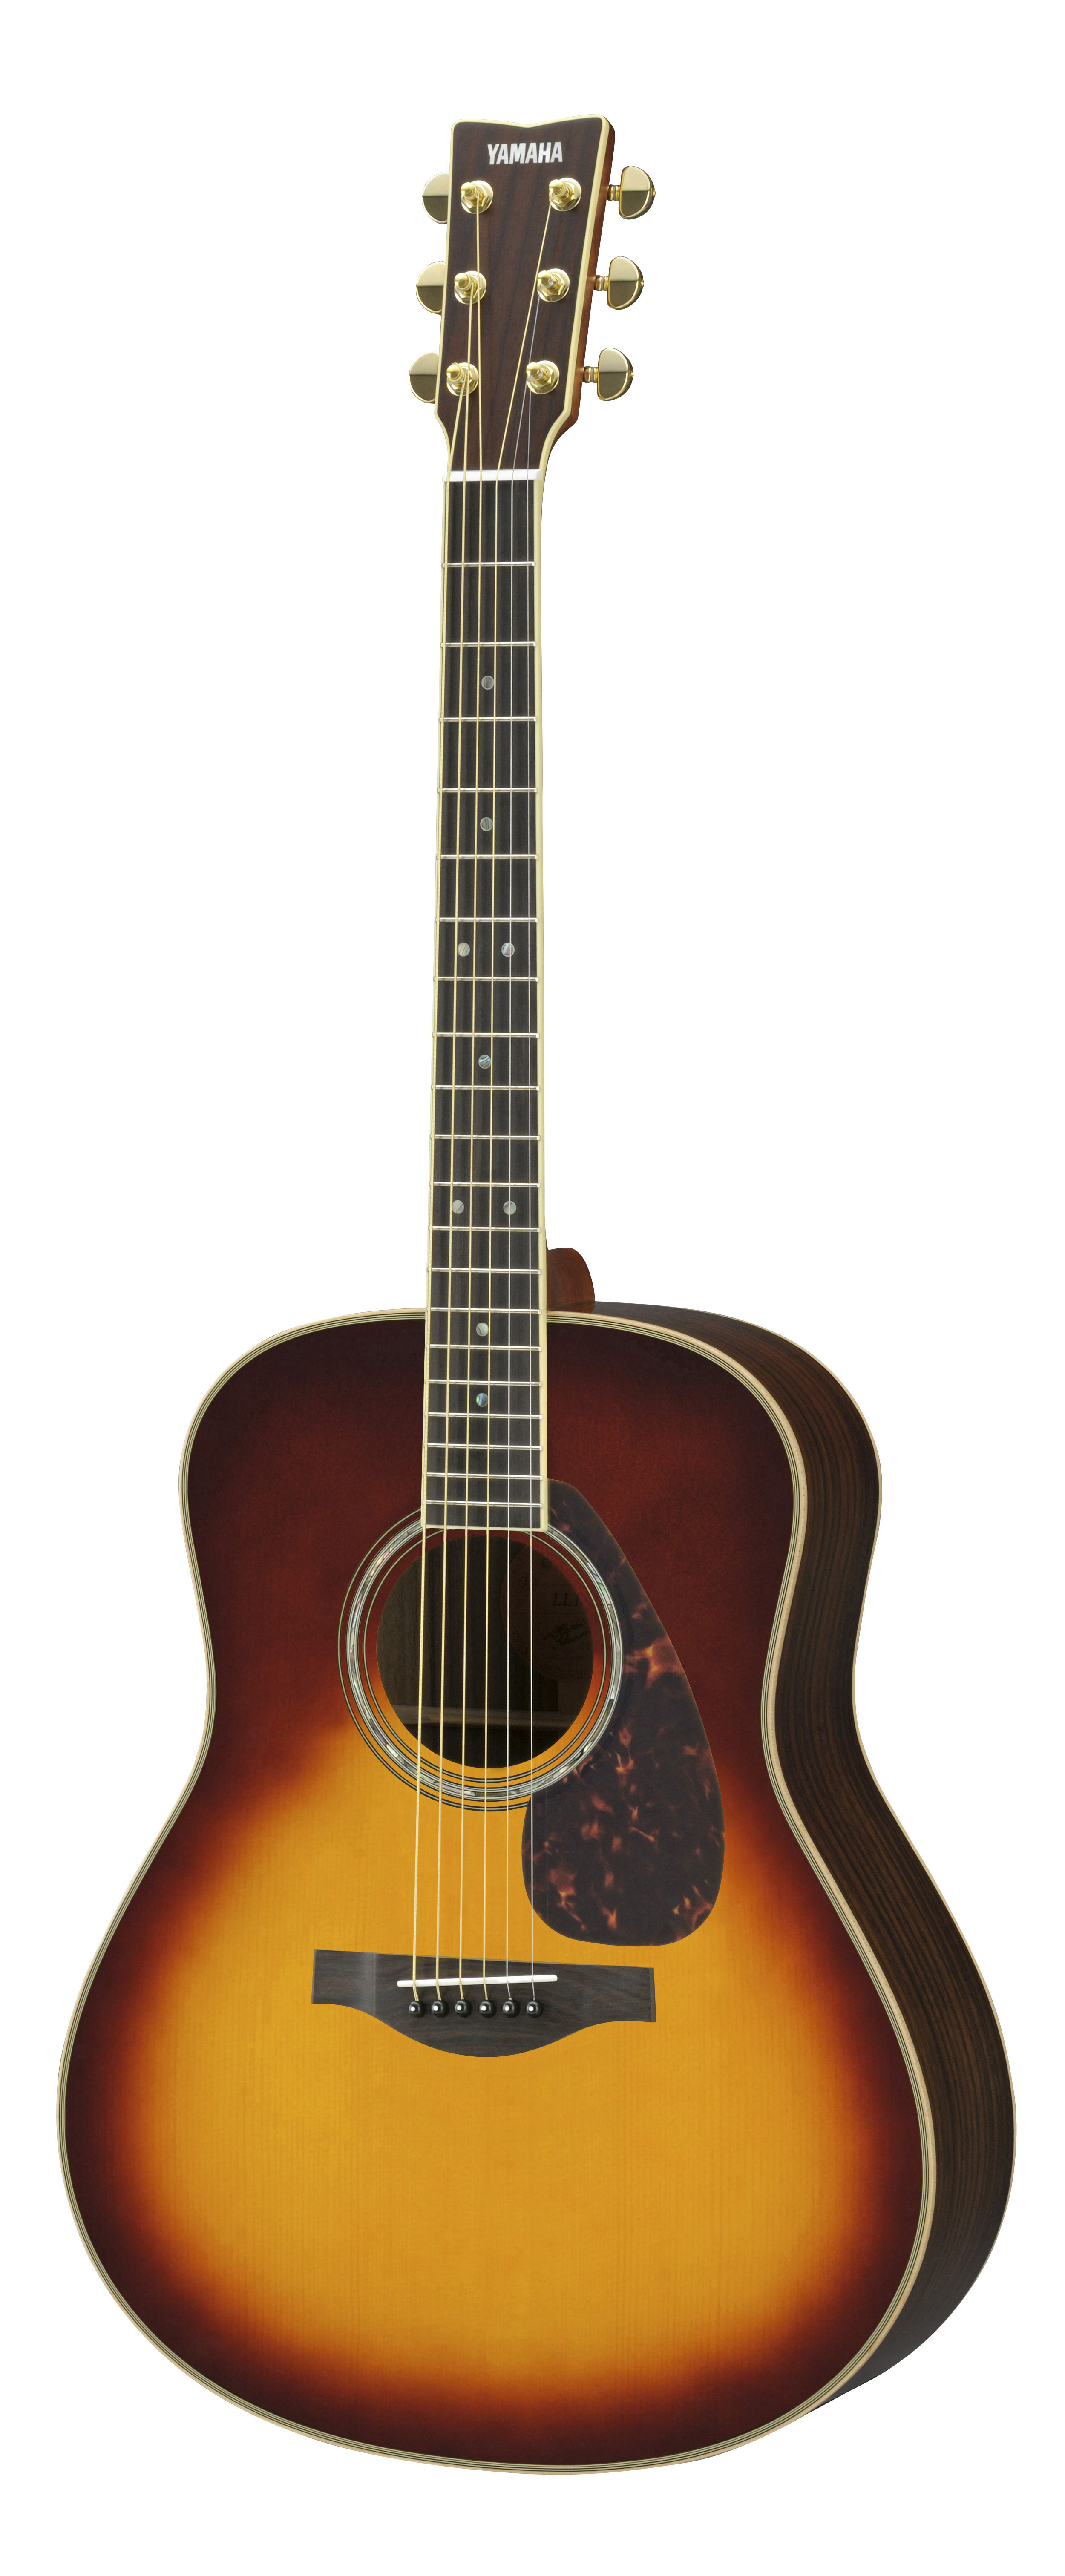 la guitare lectro avis yamaha ll16 are audiofanzine. Black Bedroom Furniture Sets. Home Design Ideas